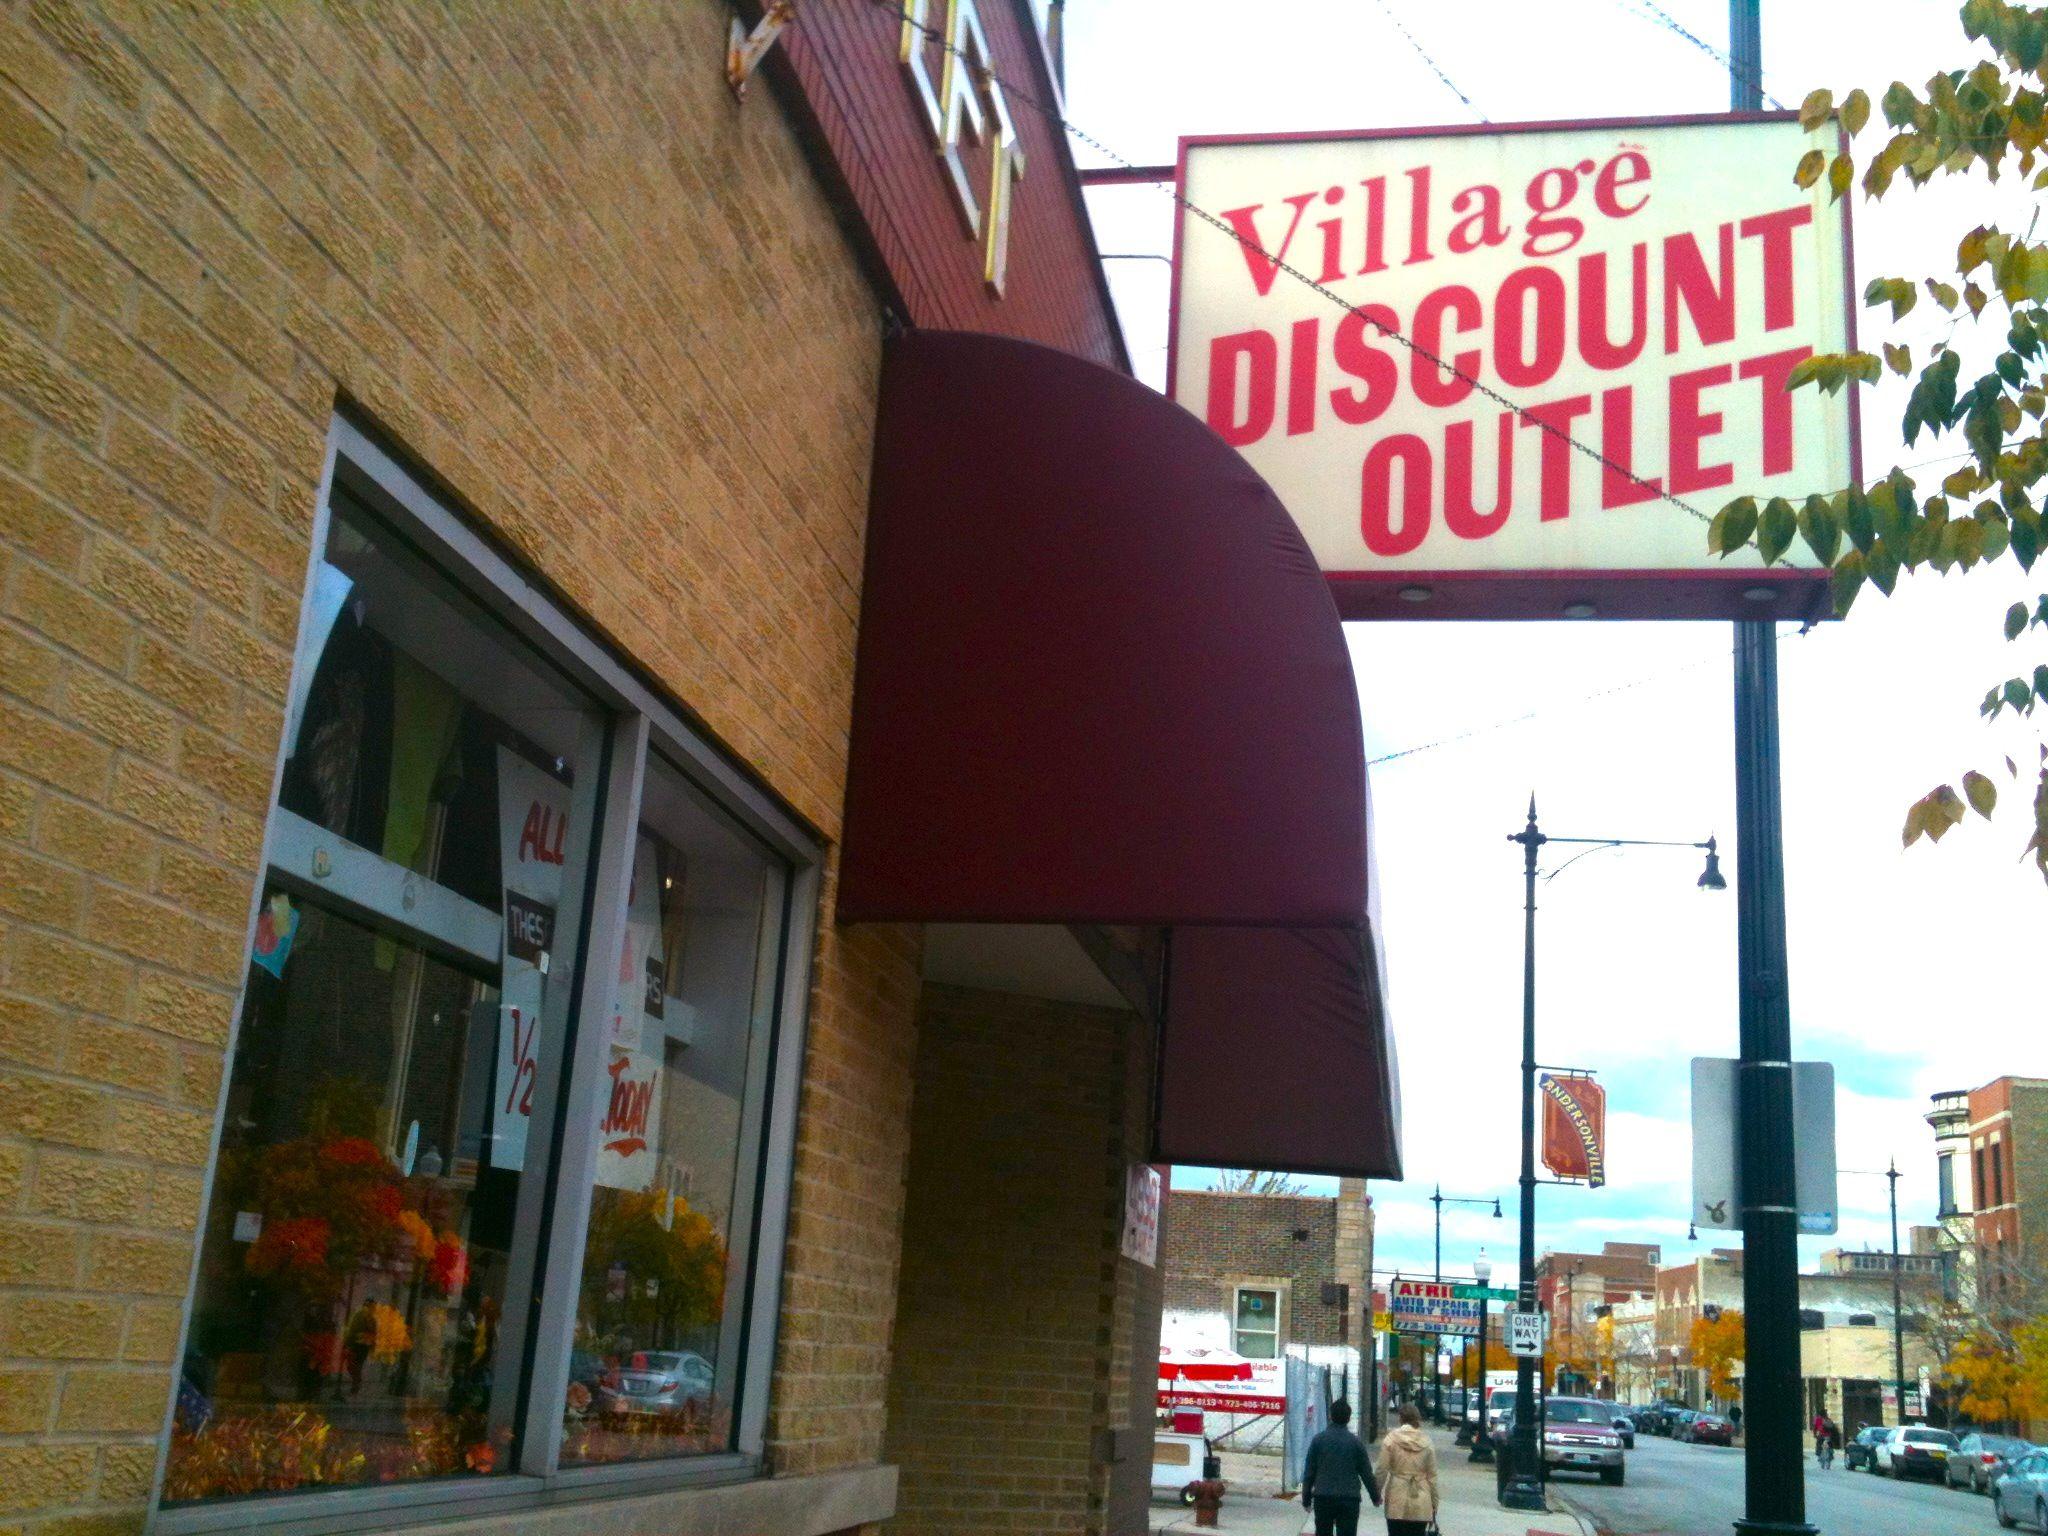 Village Discount Outlet, Chicago Clark Street Chicago Chicago-5166